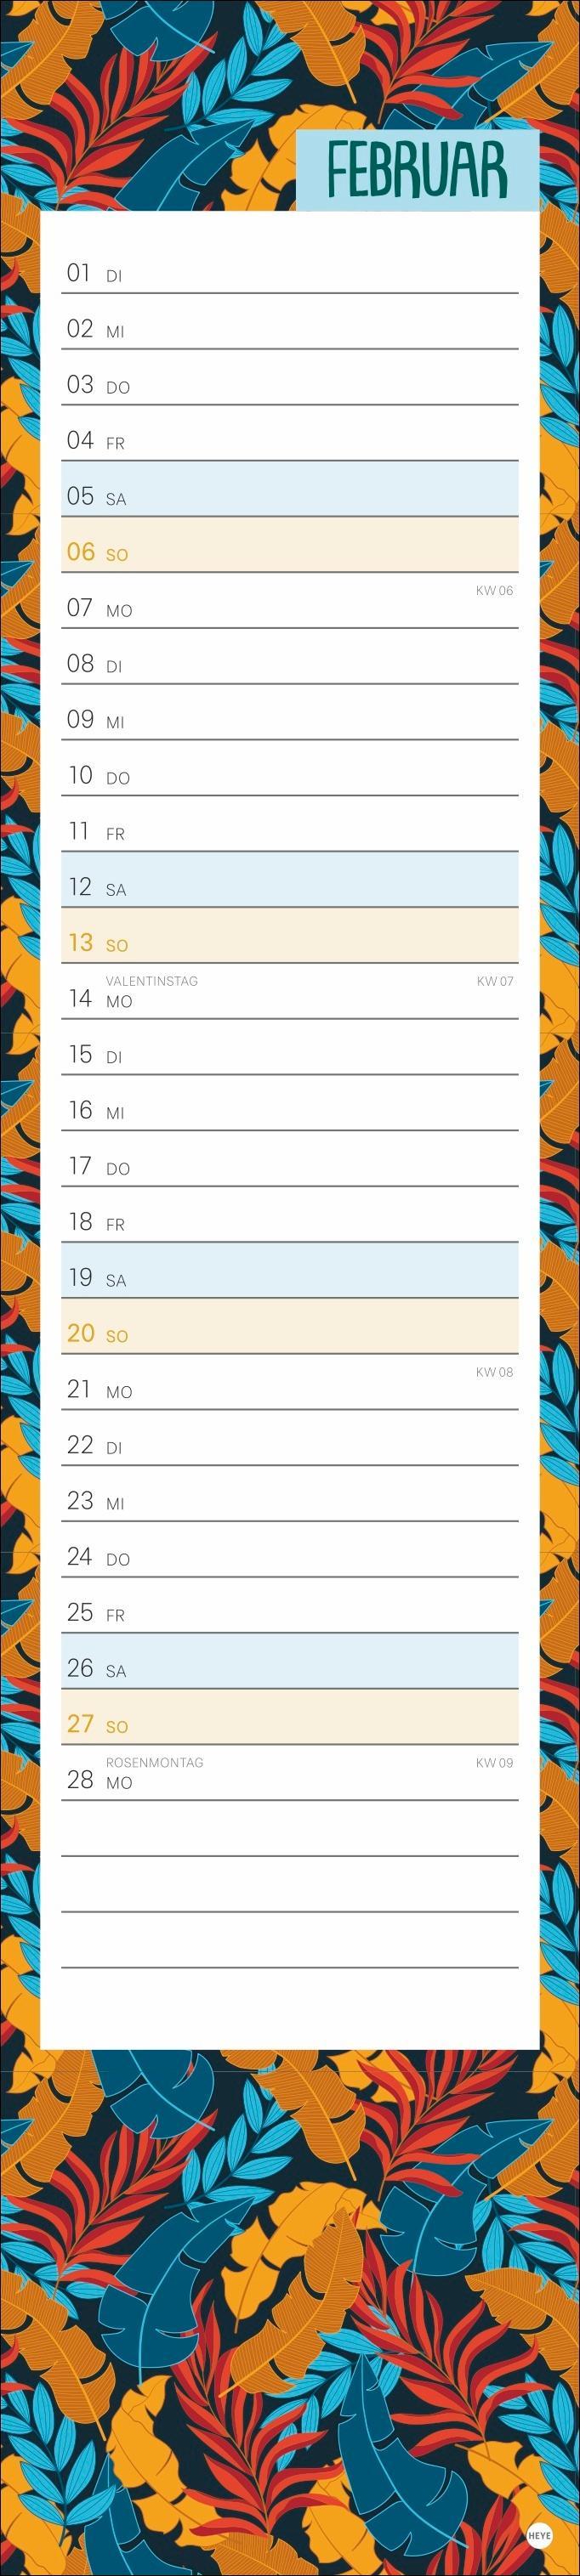 Tropical Leaves long Kalender 2022